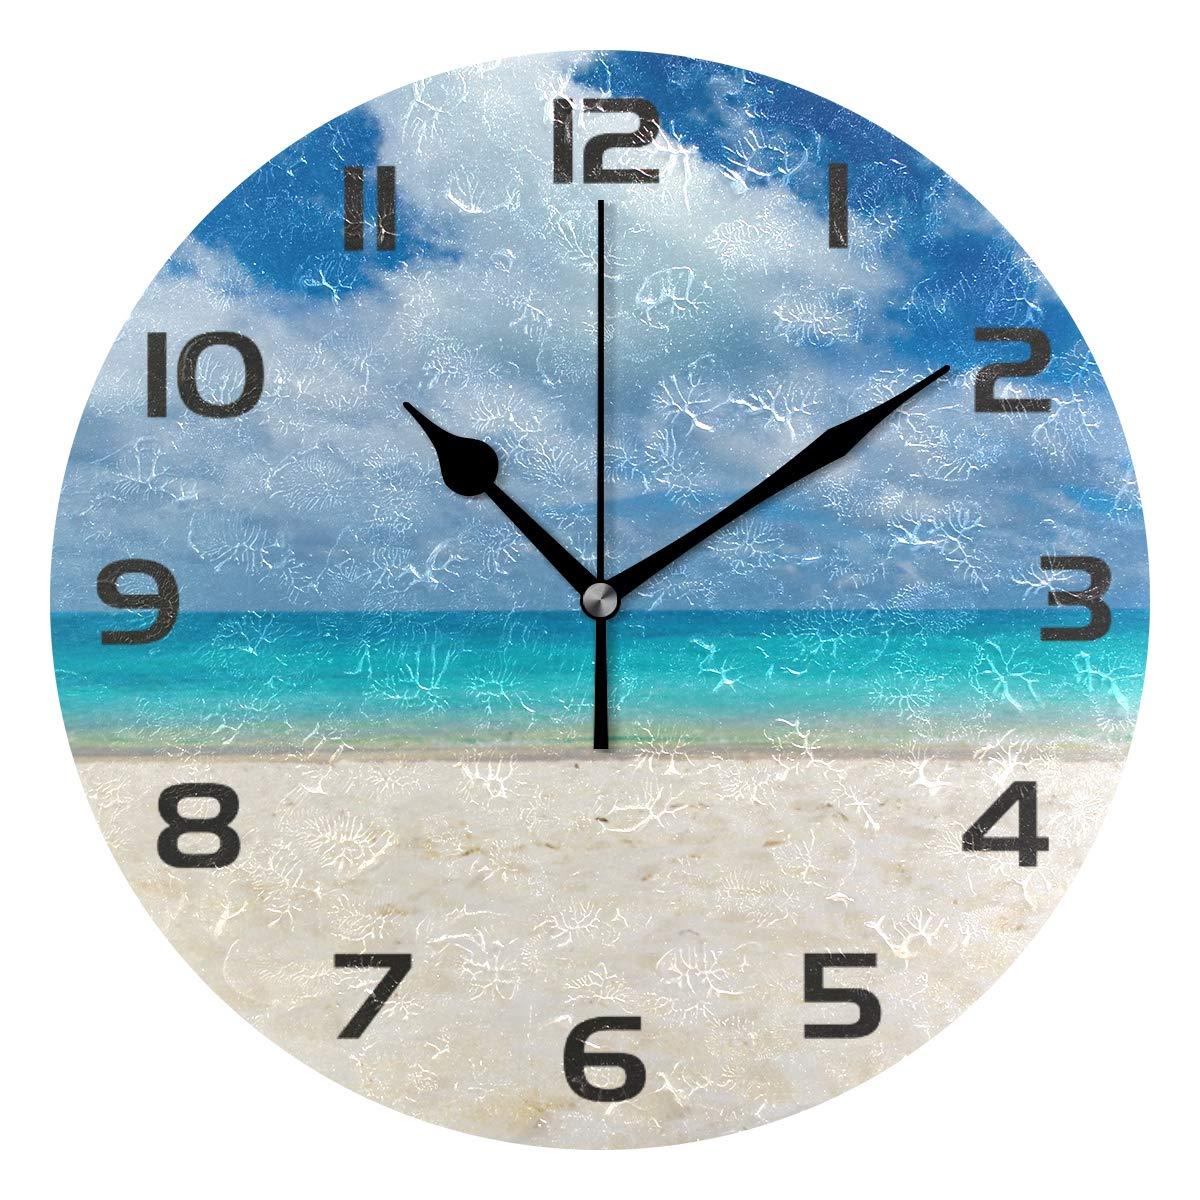 One Bear Beautiful Beach Wall Clock, Non Ticking Quartz Analog Silent  Seashore Sea Ocean Blue Sky Round Clocks Battery Operated for Kitchen  Bathroom ...